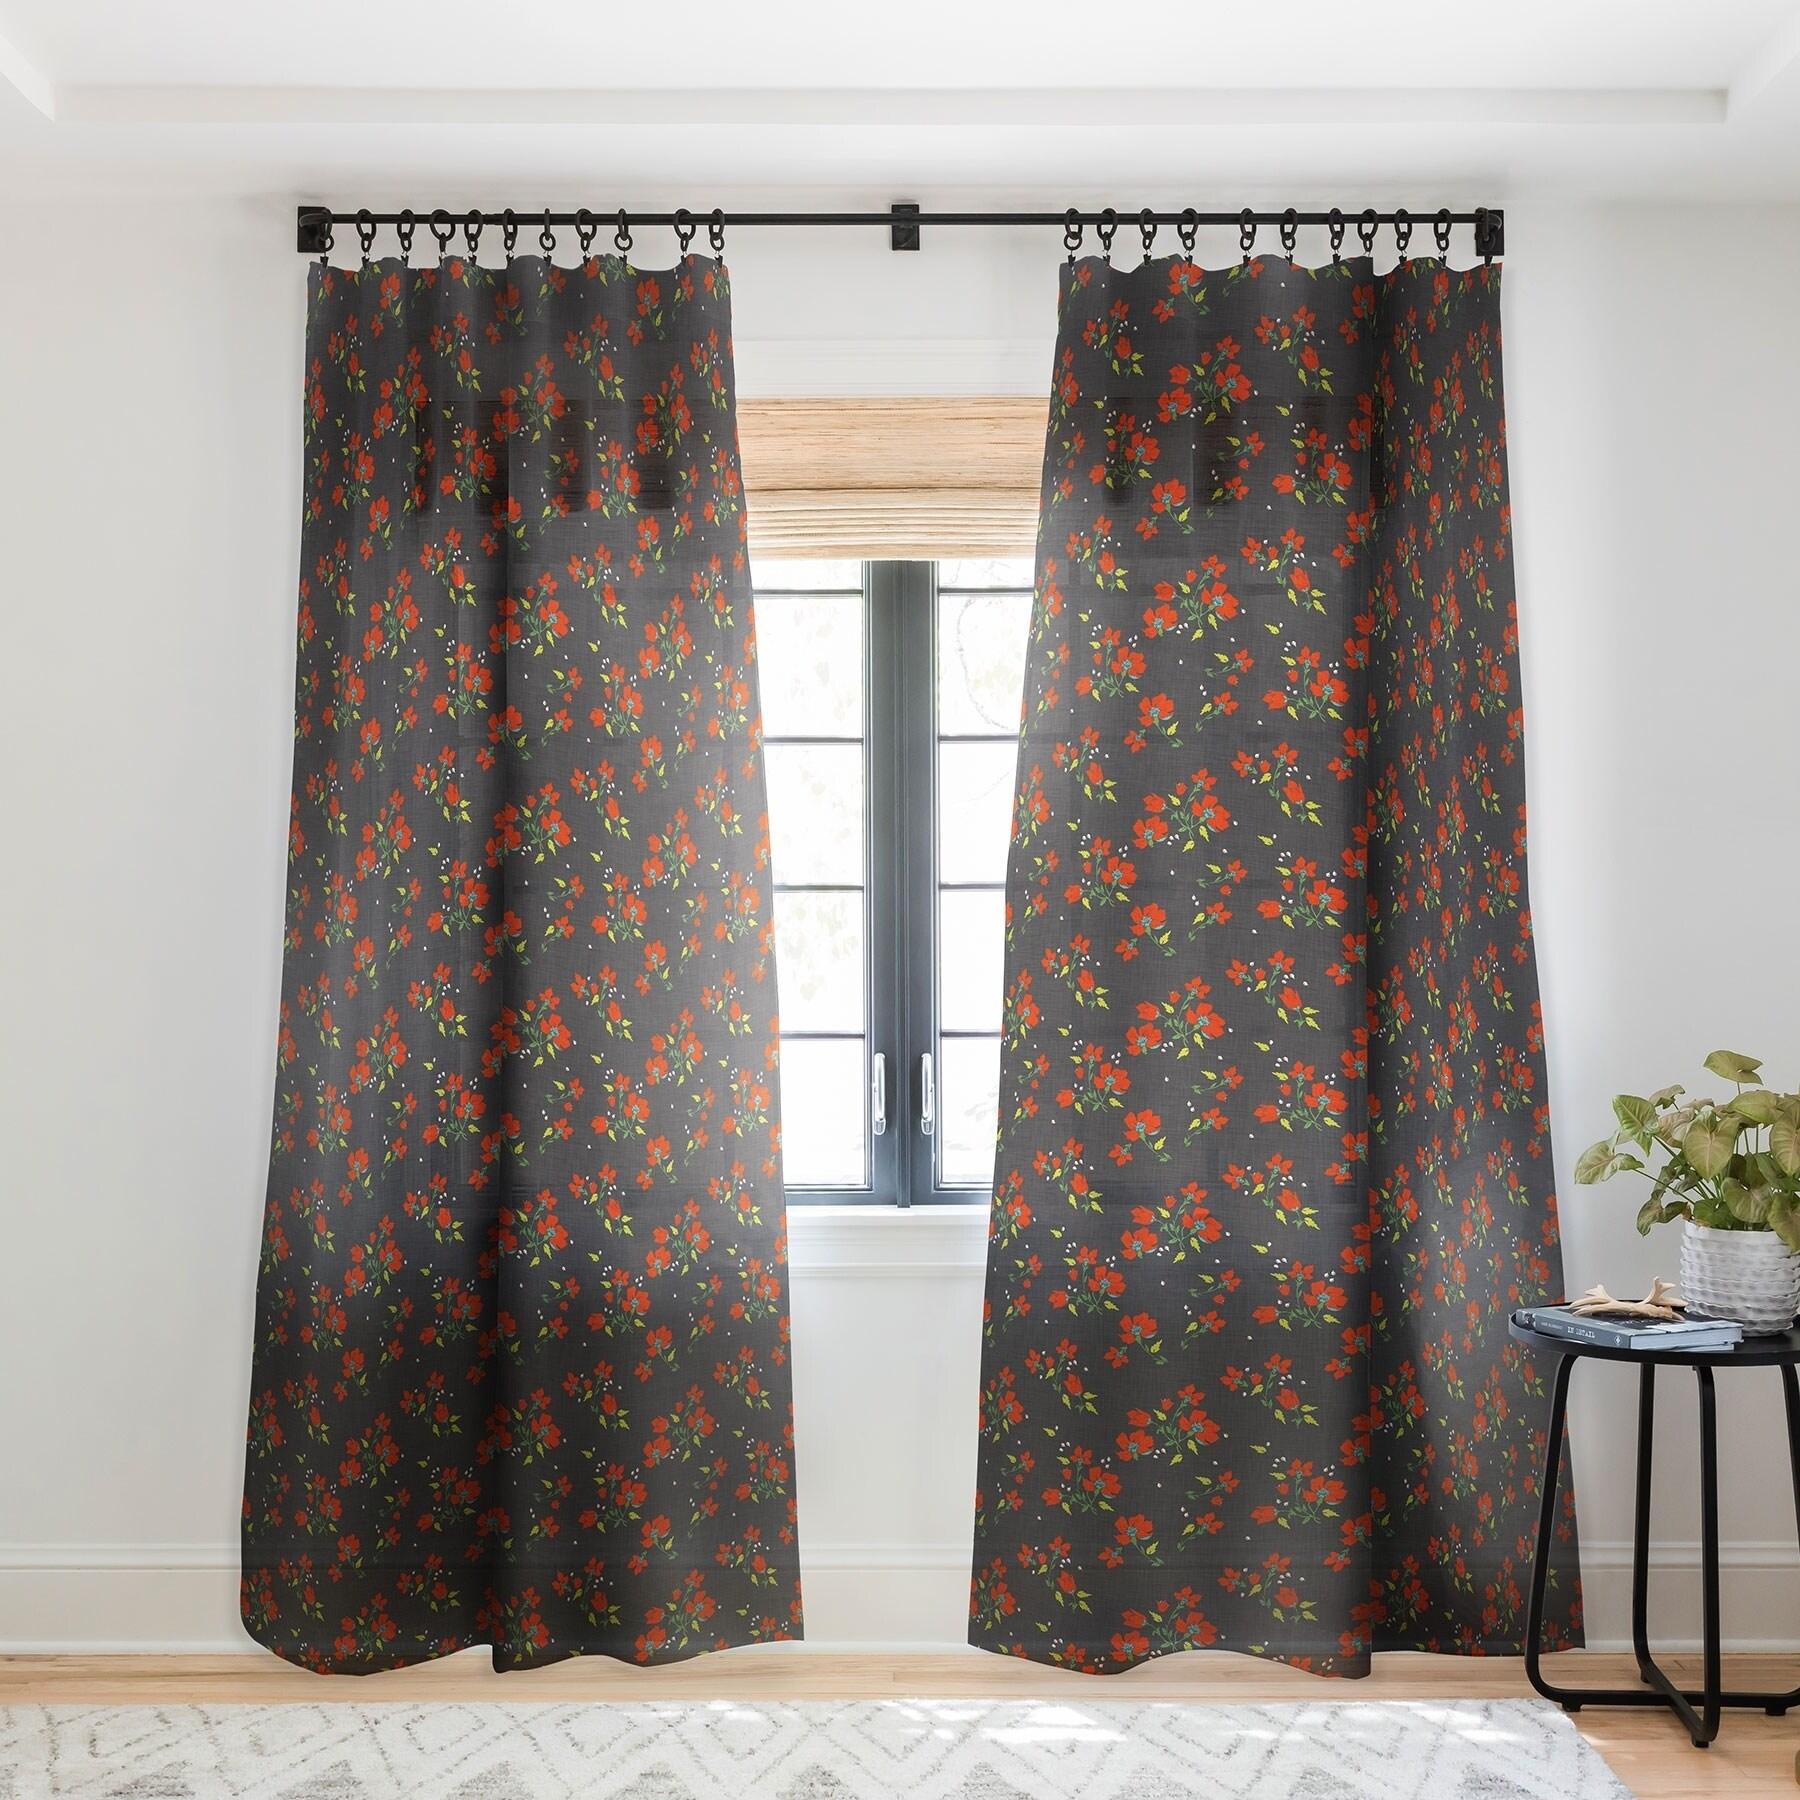 Holli Zollinger Bohemian Farmhouse Floral Single Panel Sheer Curtain 50 X 84 On Sale Overstock 22043515